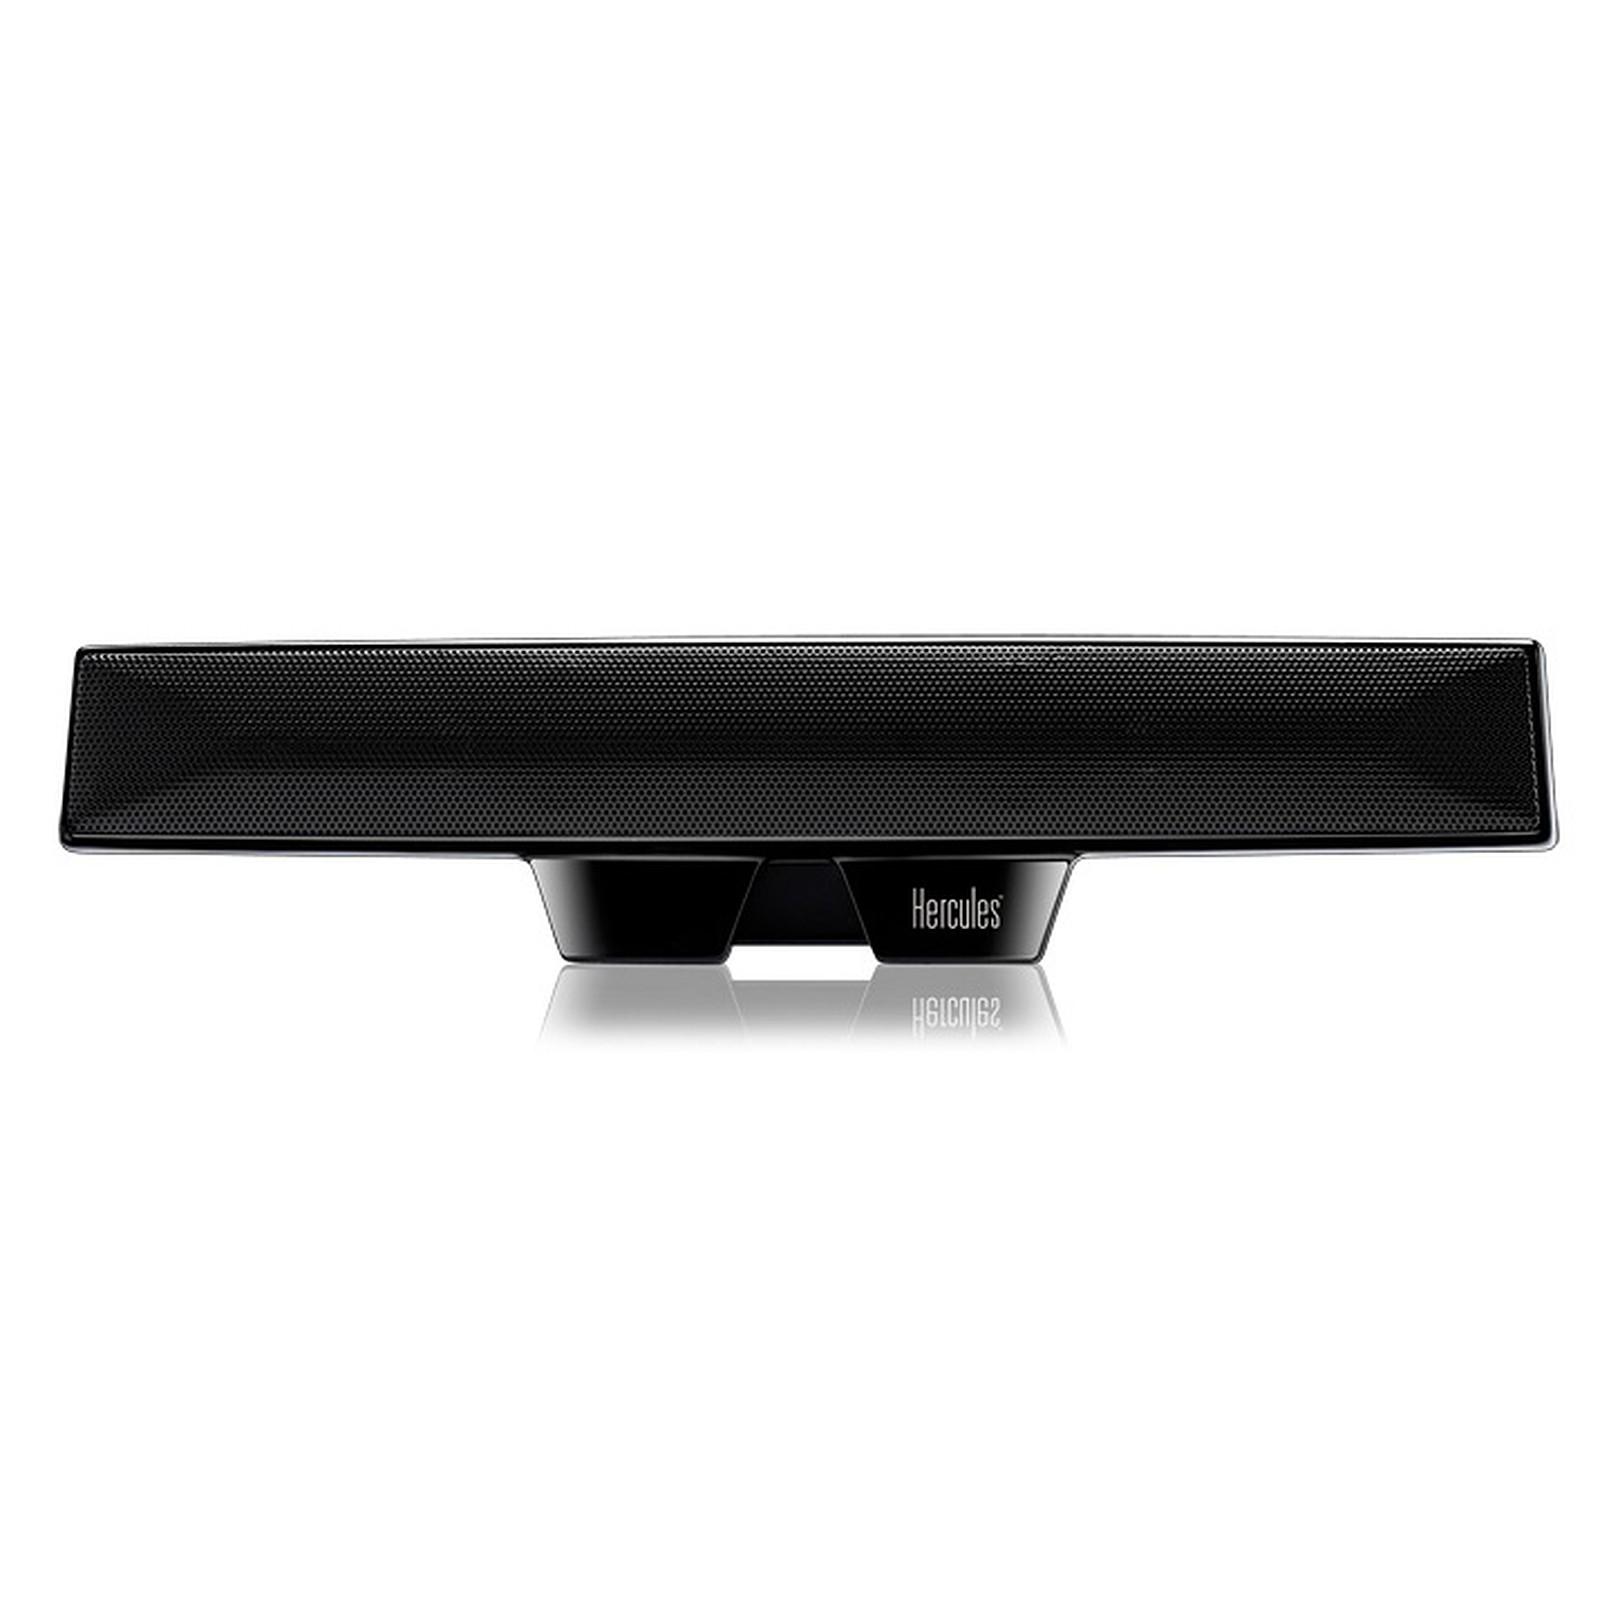 Hercules XPS Sound Bar